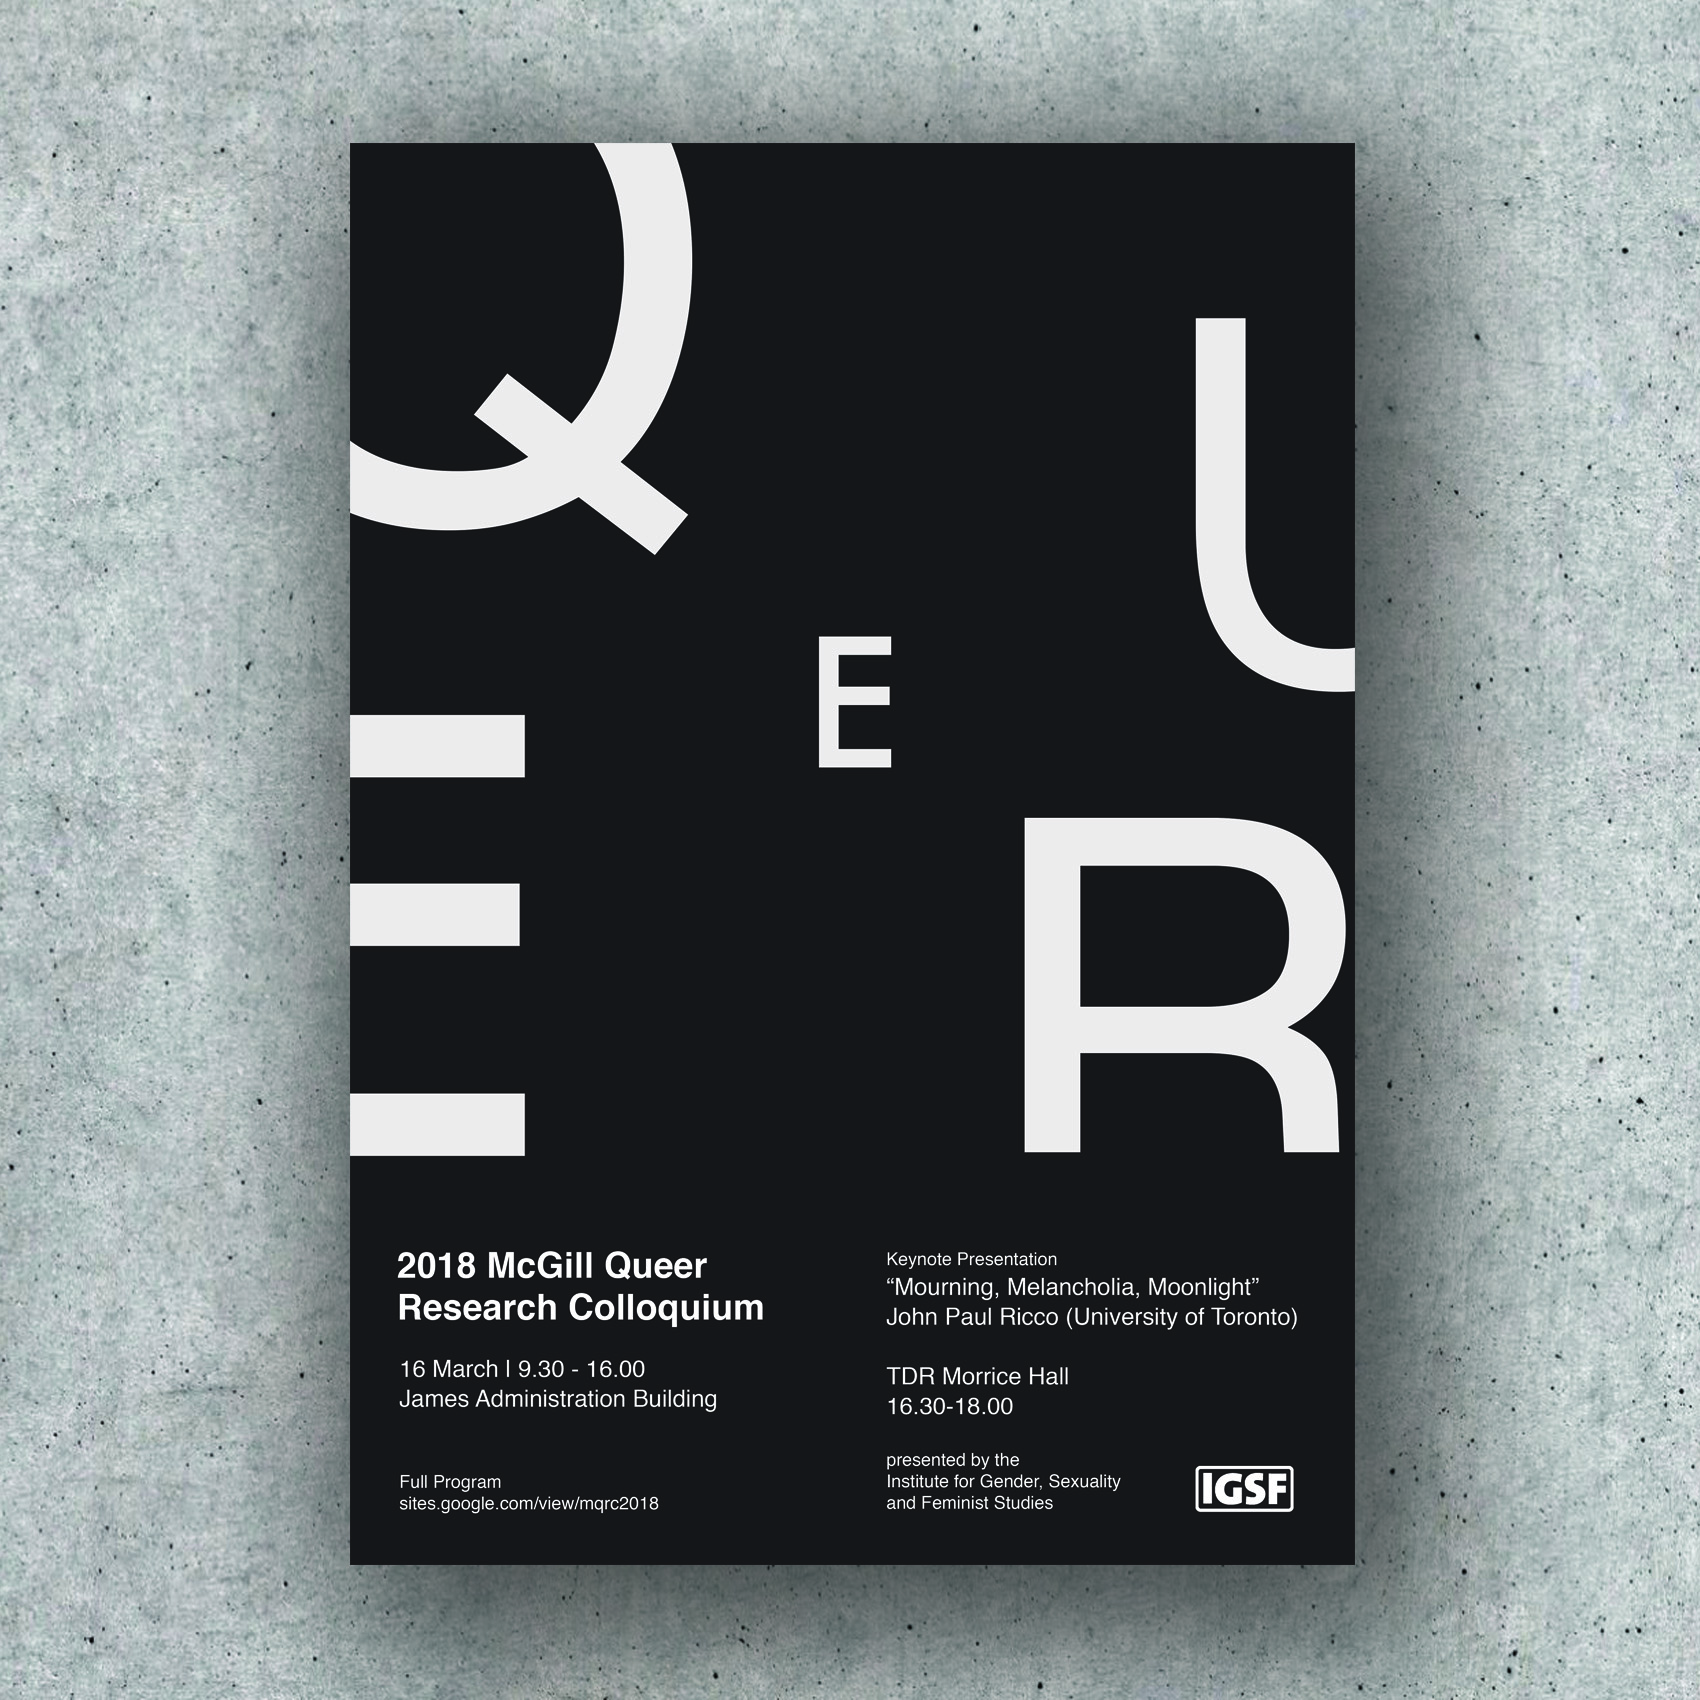 mqrc2018_poster